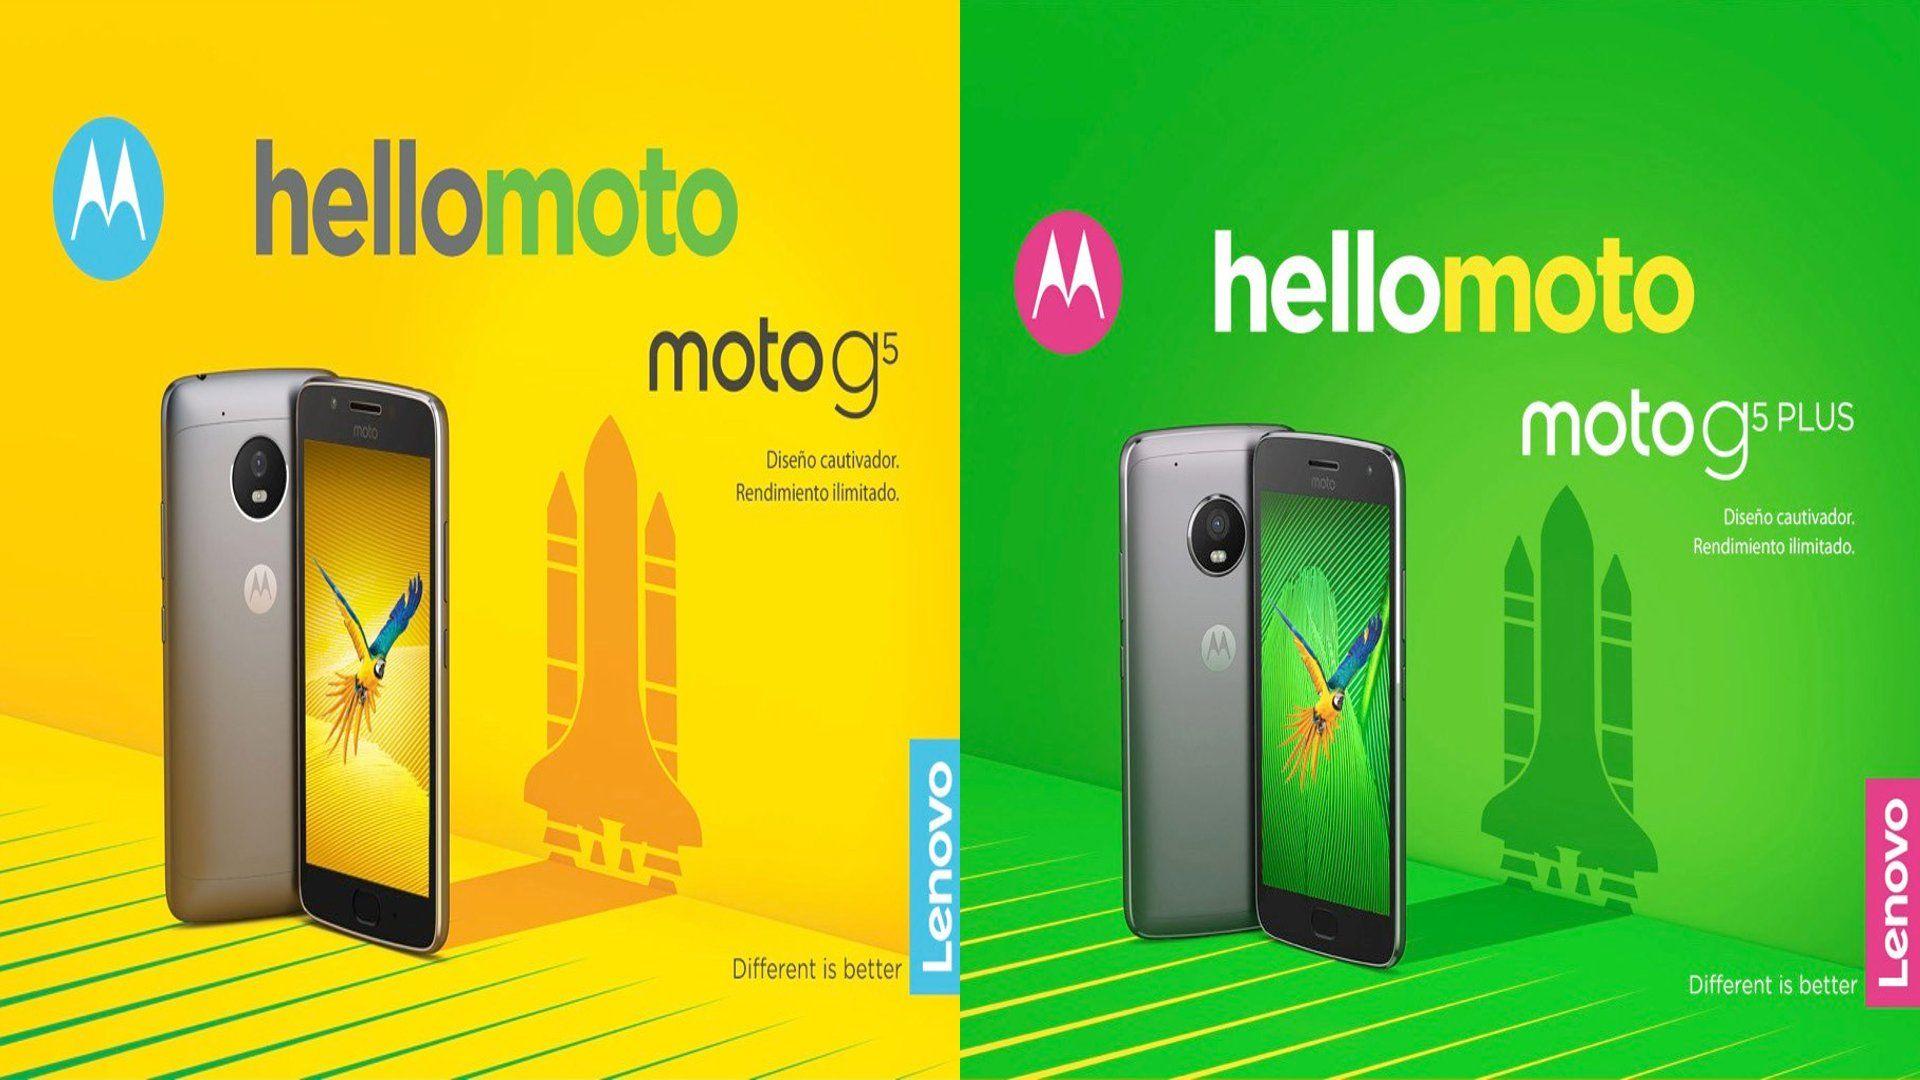 Moto G5 / Moto G5 Plus